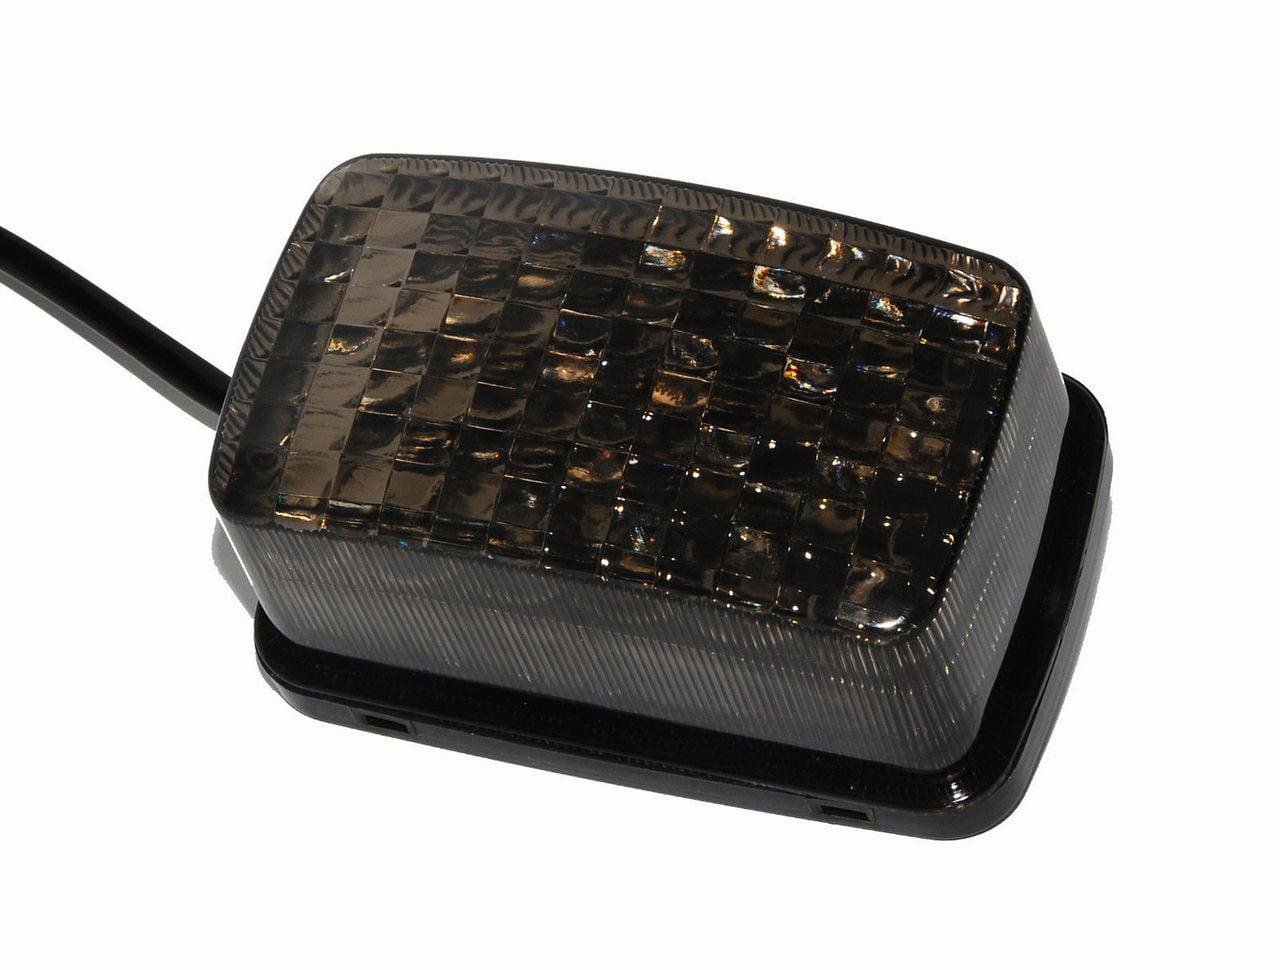 YFM LED Smoke lens tail brake stop light for yamaha atv 350 400 450 660 250 4x4